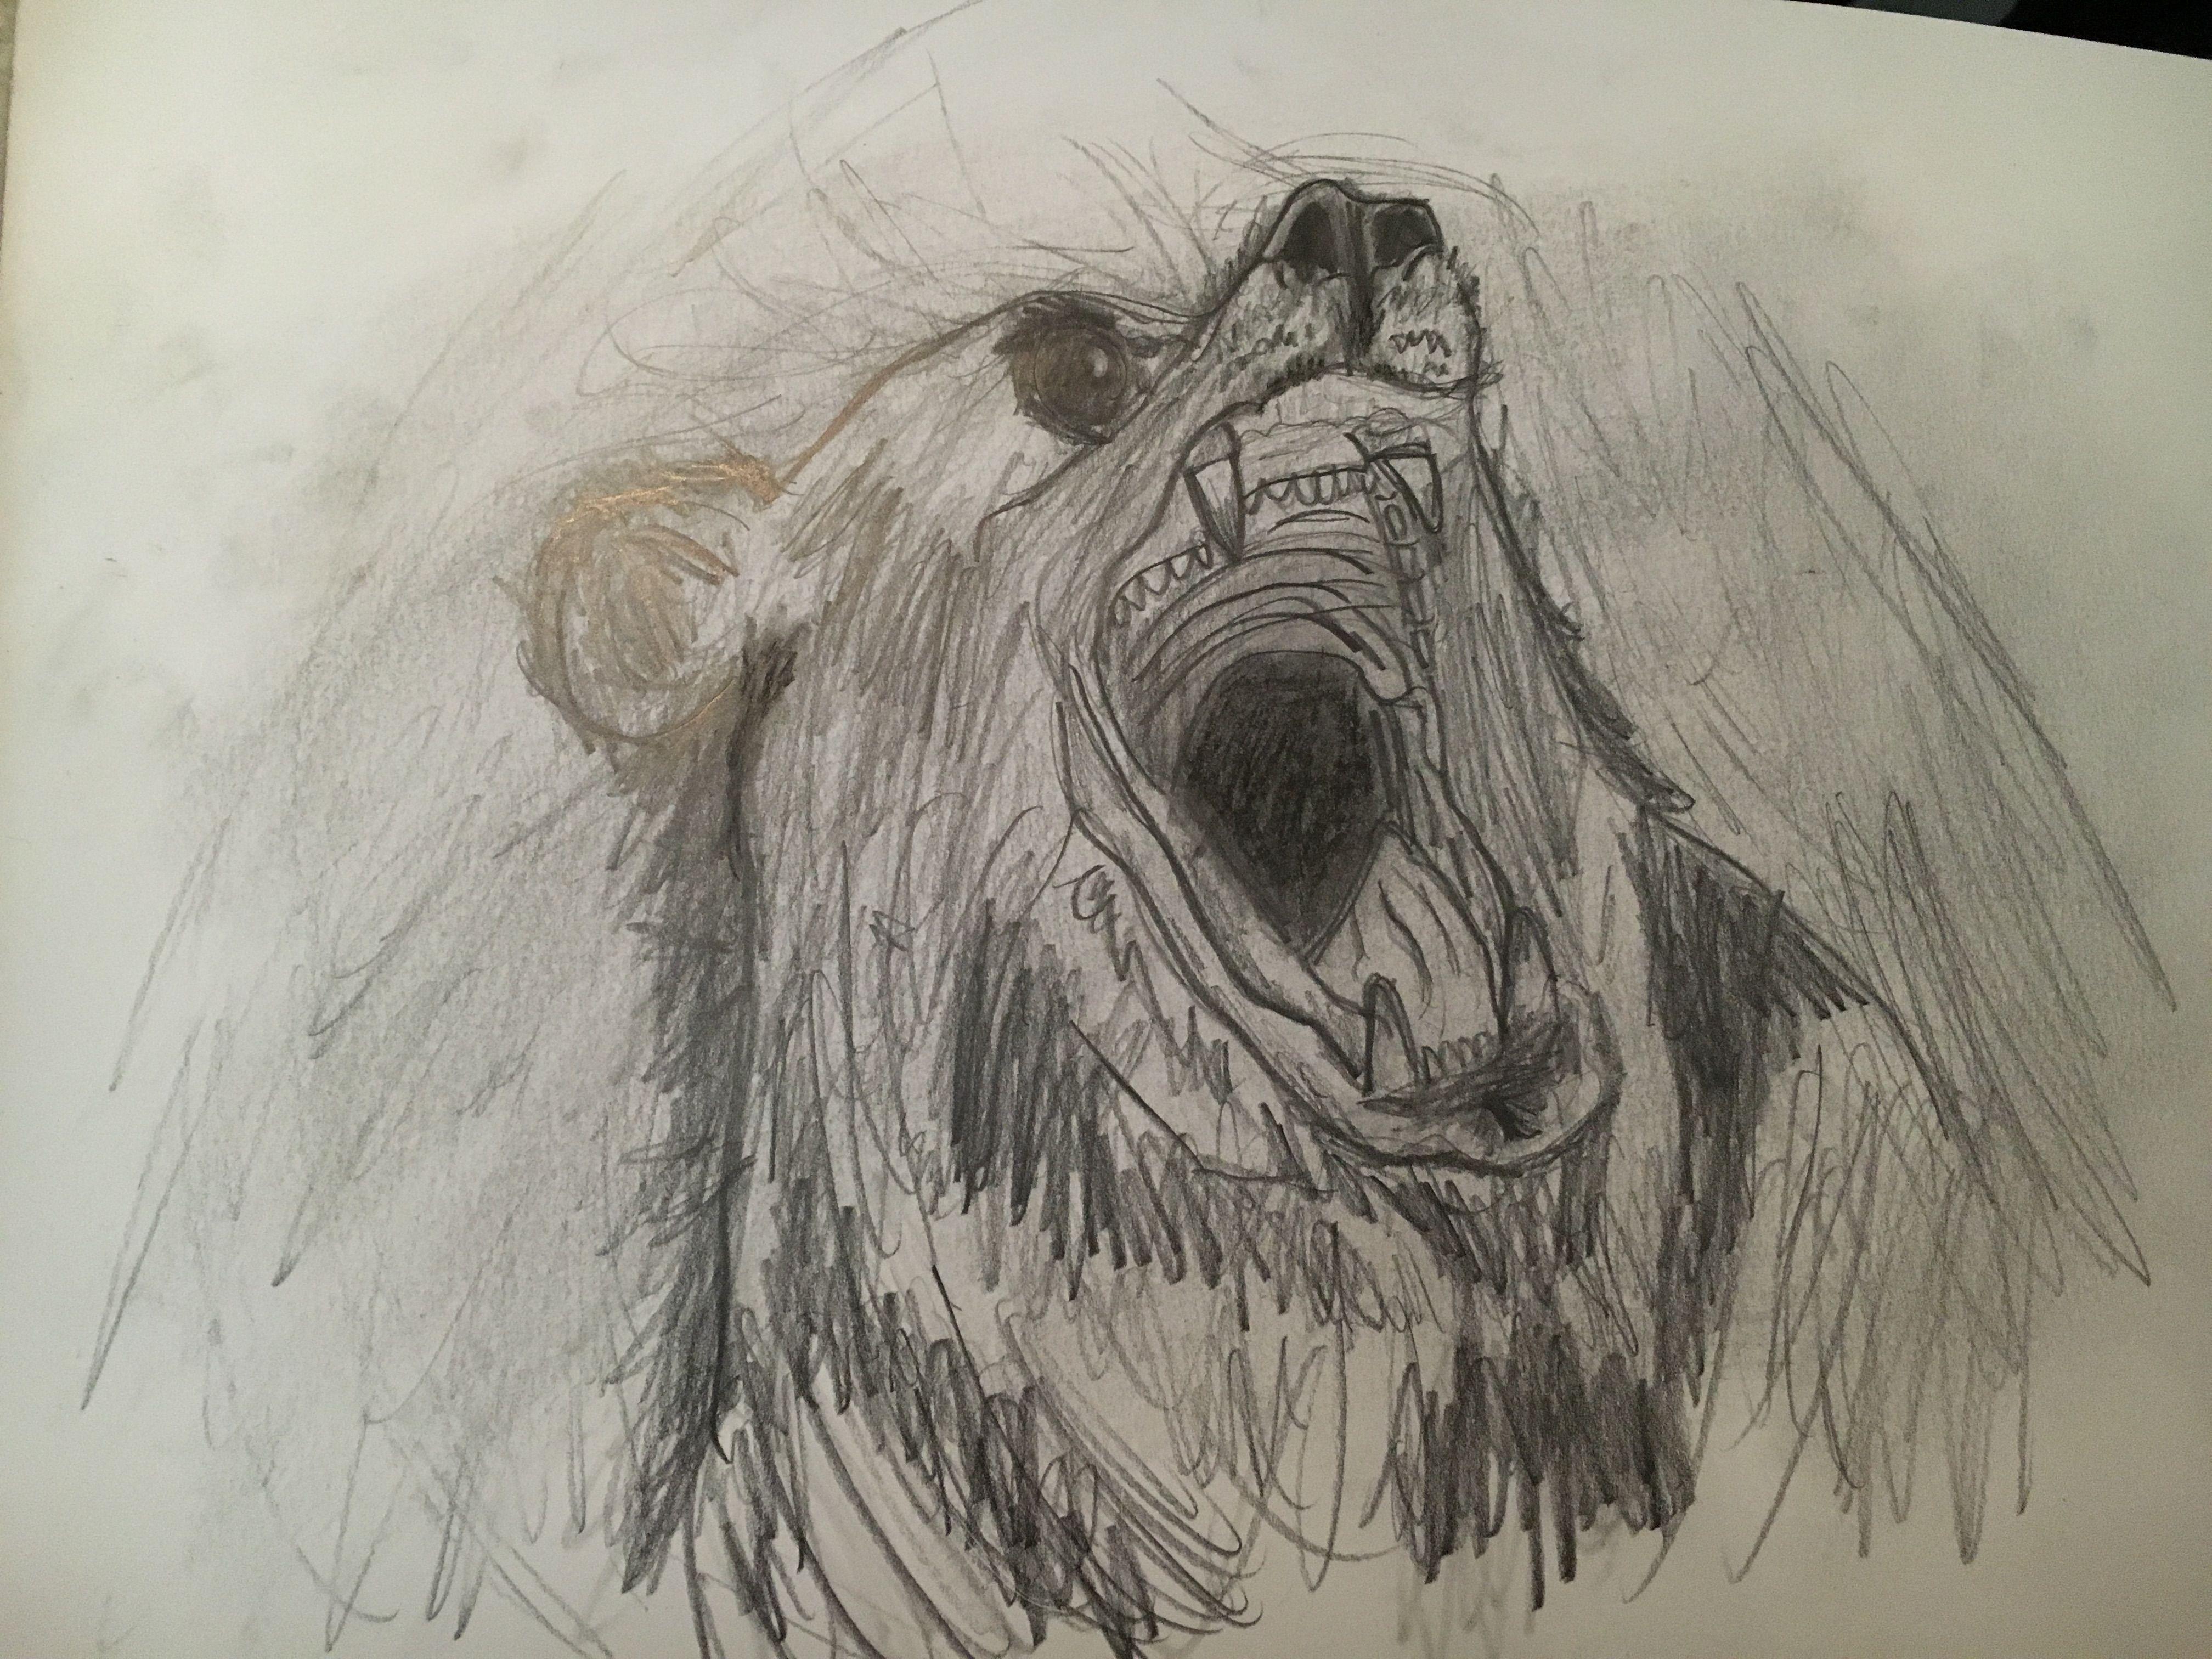 4032x3024 Roaring Bear I Drew W Charcoal Set My Drawings I'Ve Done